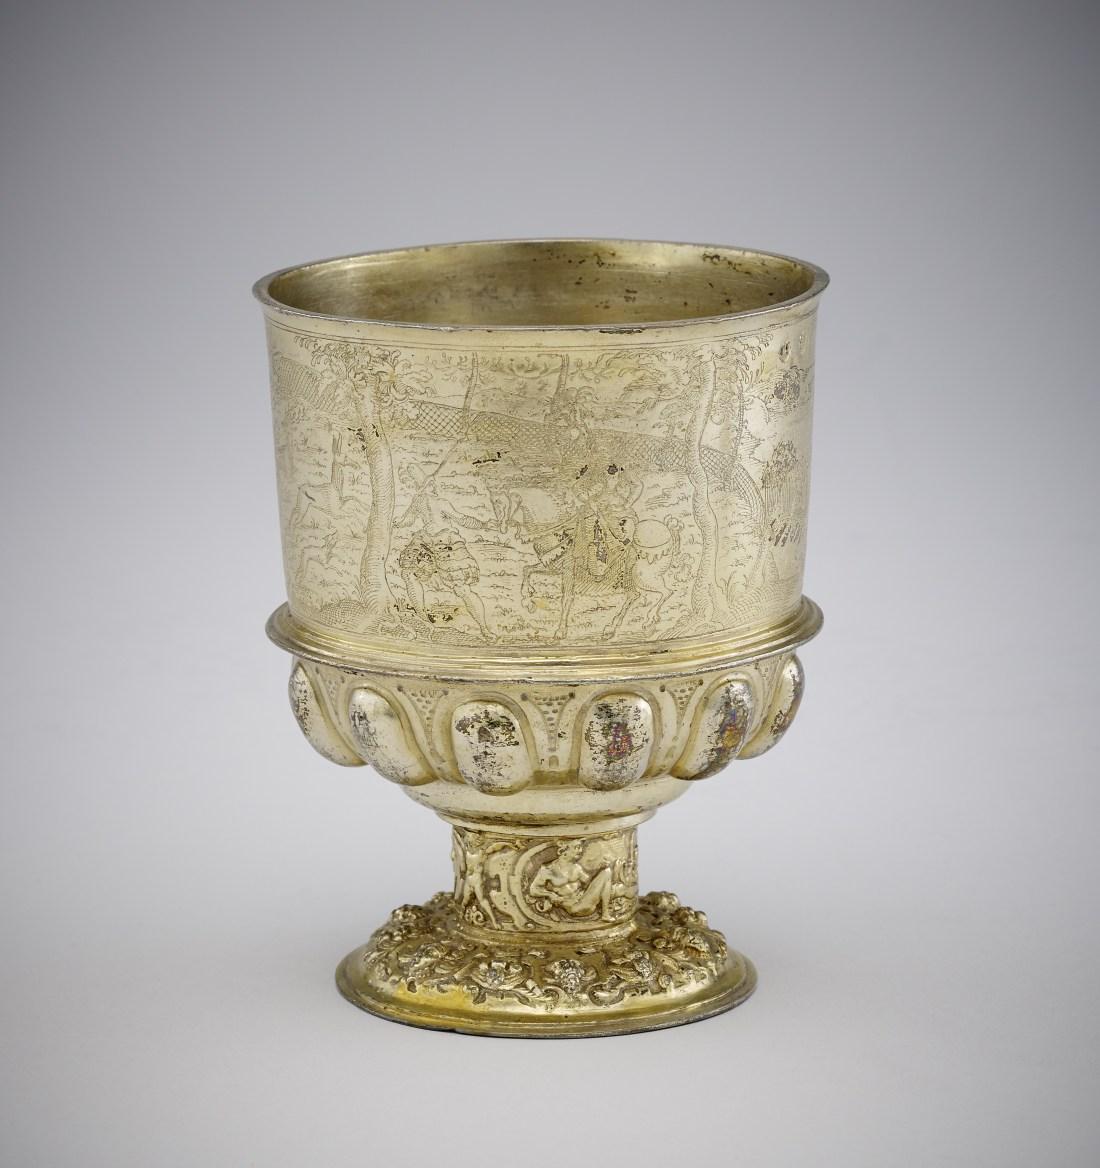 """Satzbecher"" (stacking cup).1575-1600. Silver gilt."